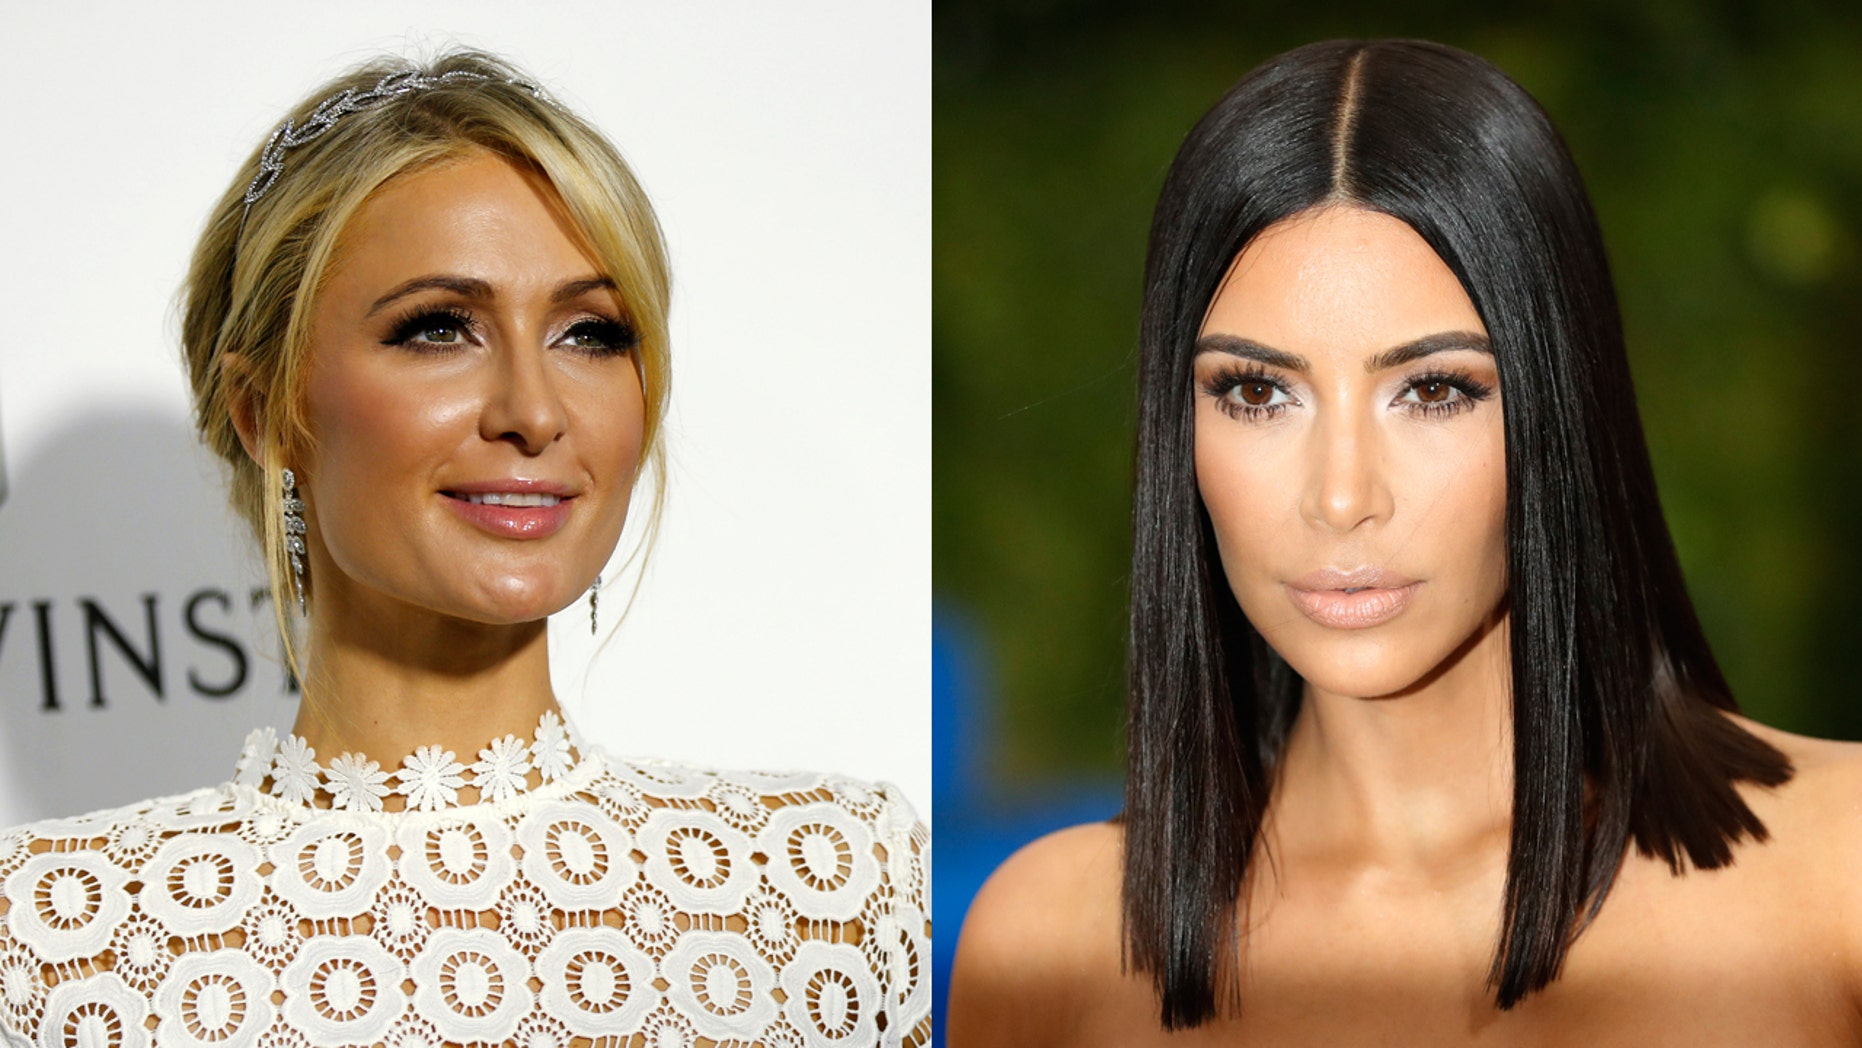 Kim Kardashian dresses up friend Paris Hilton as herself to advertise Yeezy Season 6 collection.